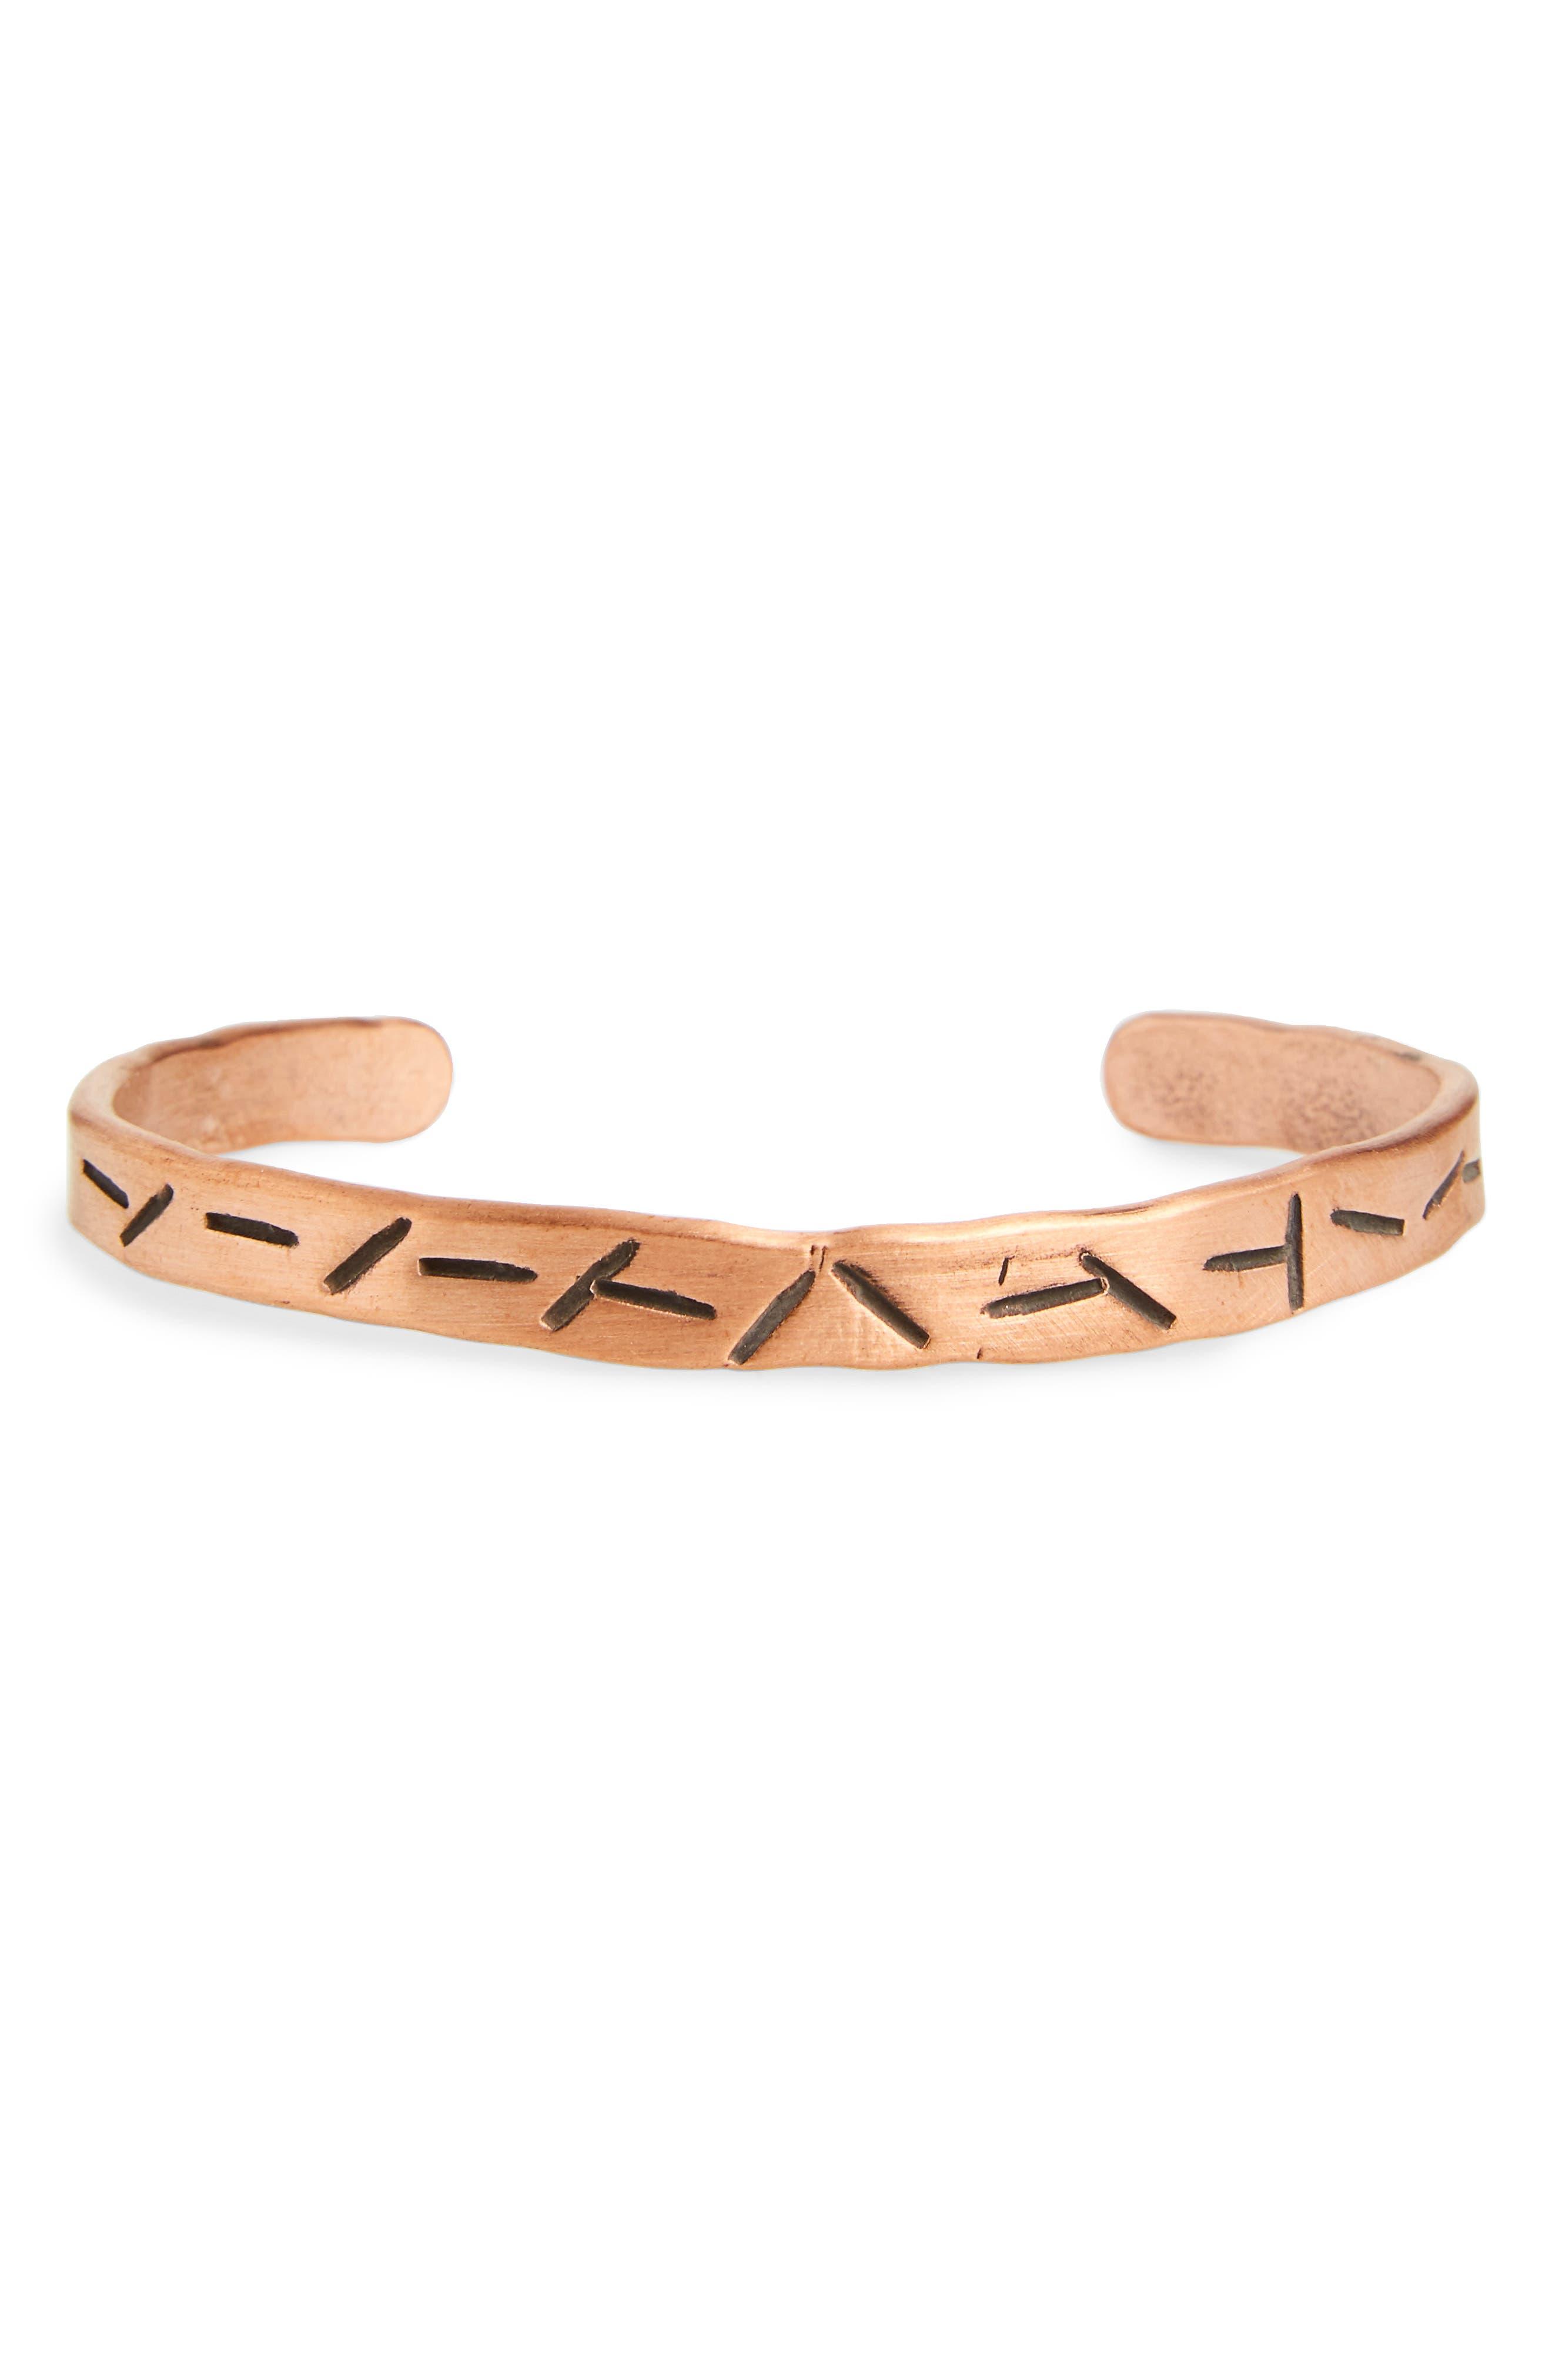 Slash Copper Cuff Bracelet,                         Main,                         color, 220